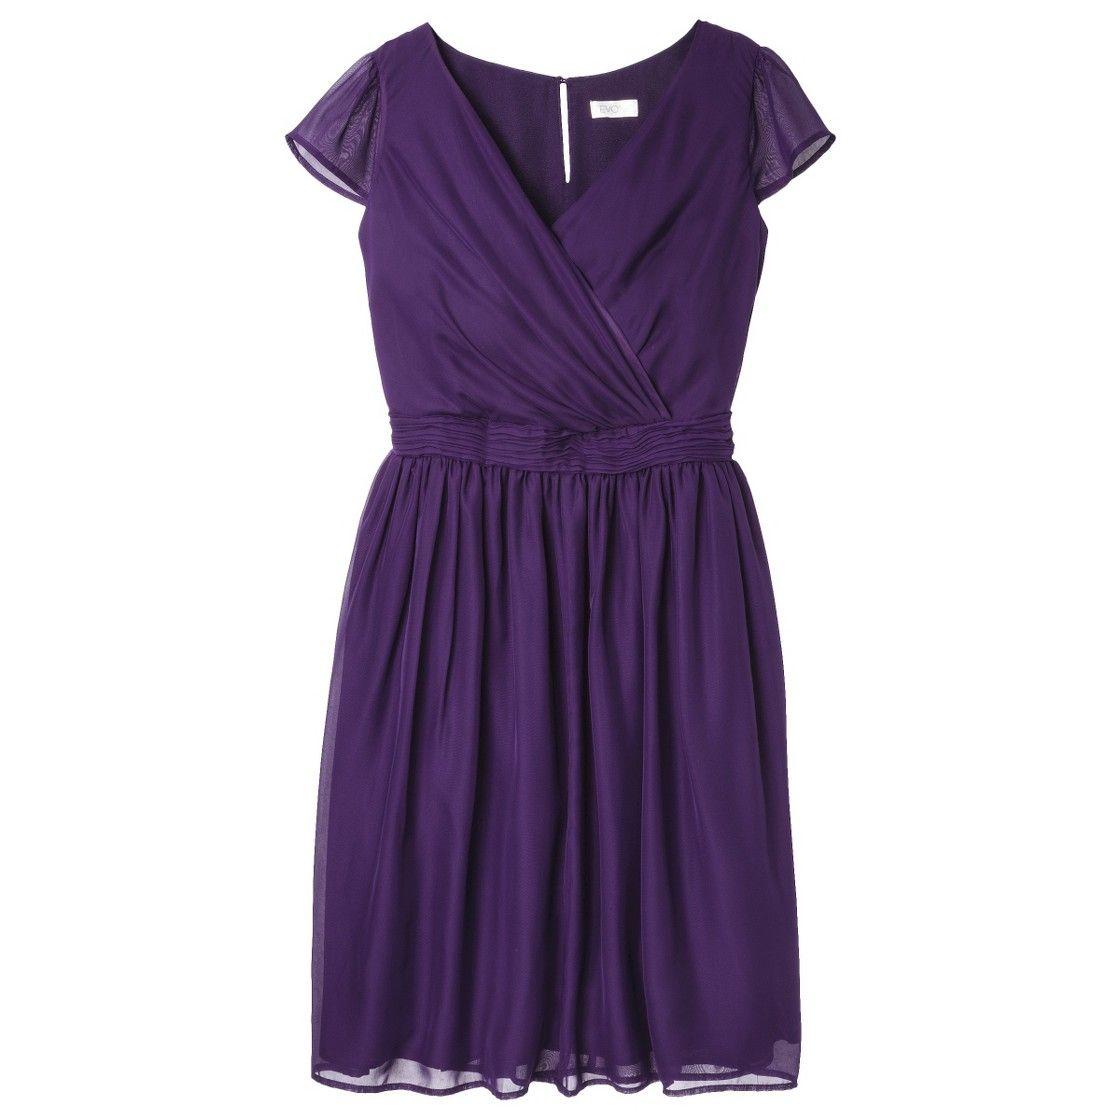 TEVOLIO Women\'s Chiffon Cap Sleeve V-Neck Dress - Fashion Colors ...